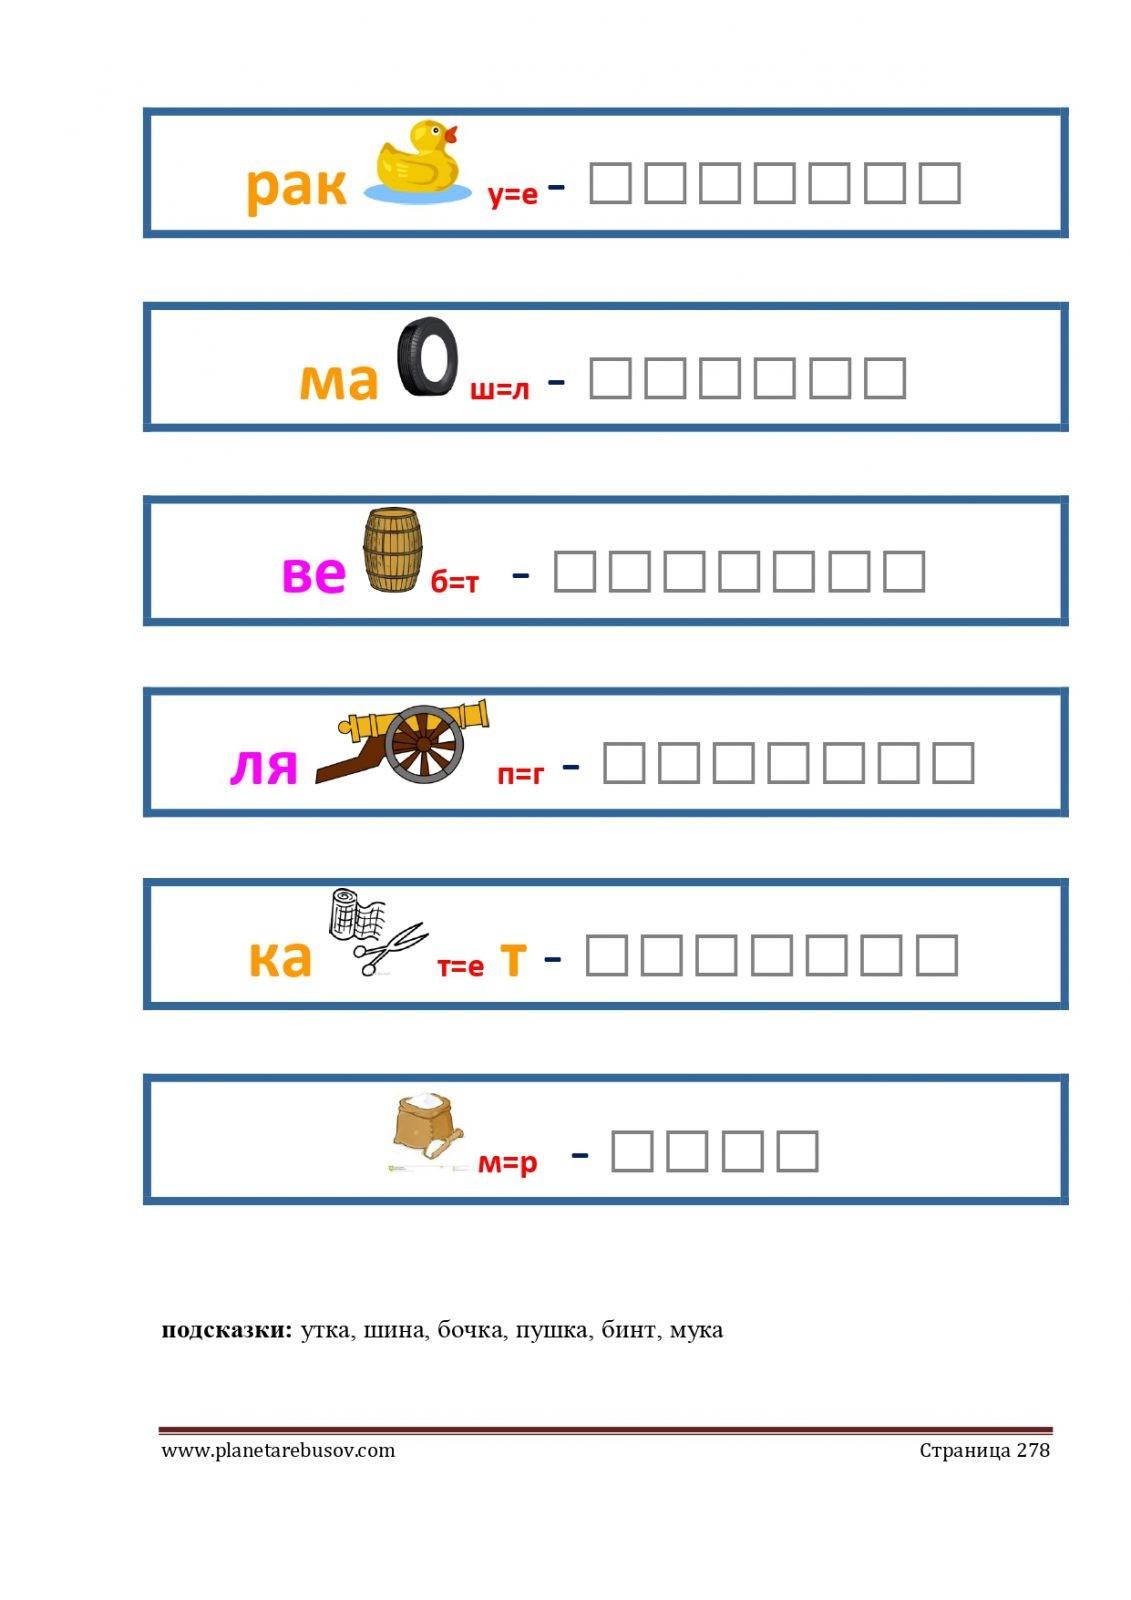 Ребусы: ракетка, малина, веточка, лягушка, кабинет, рука